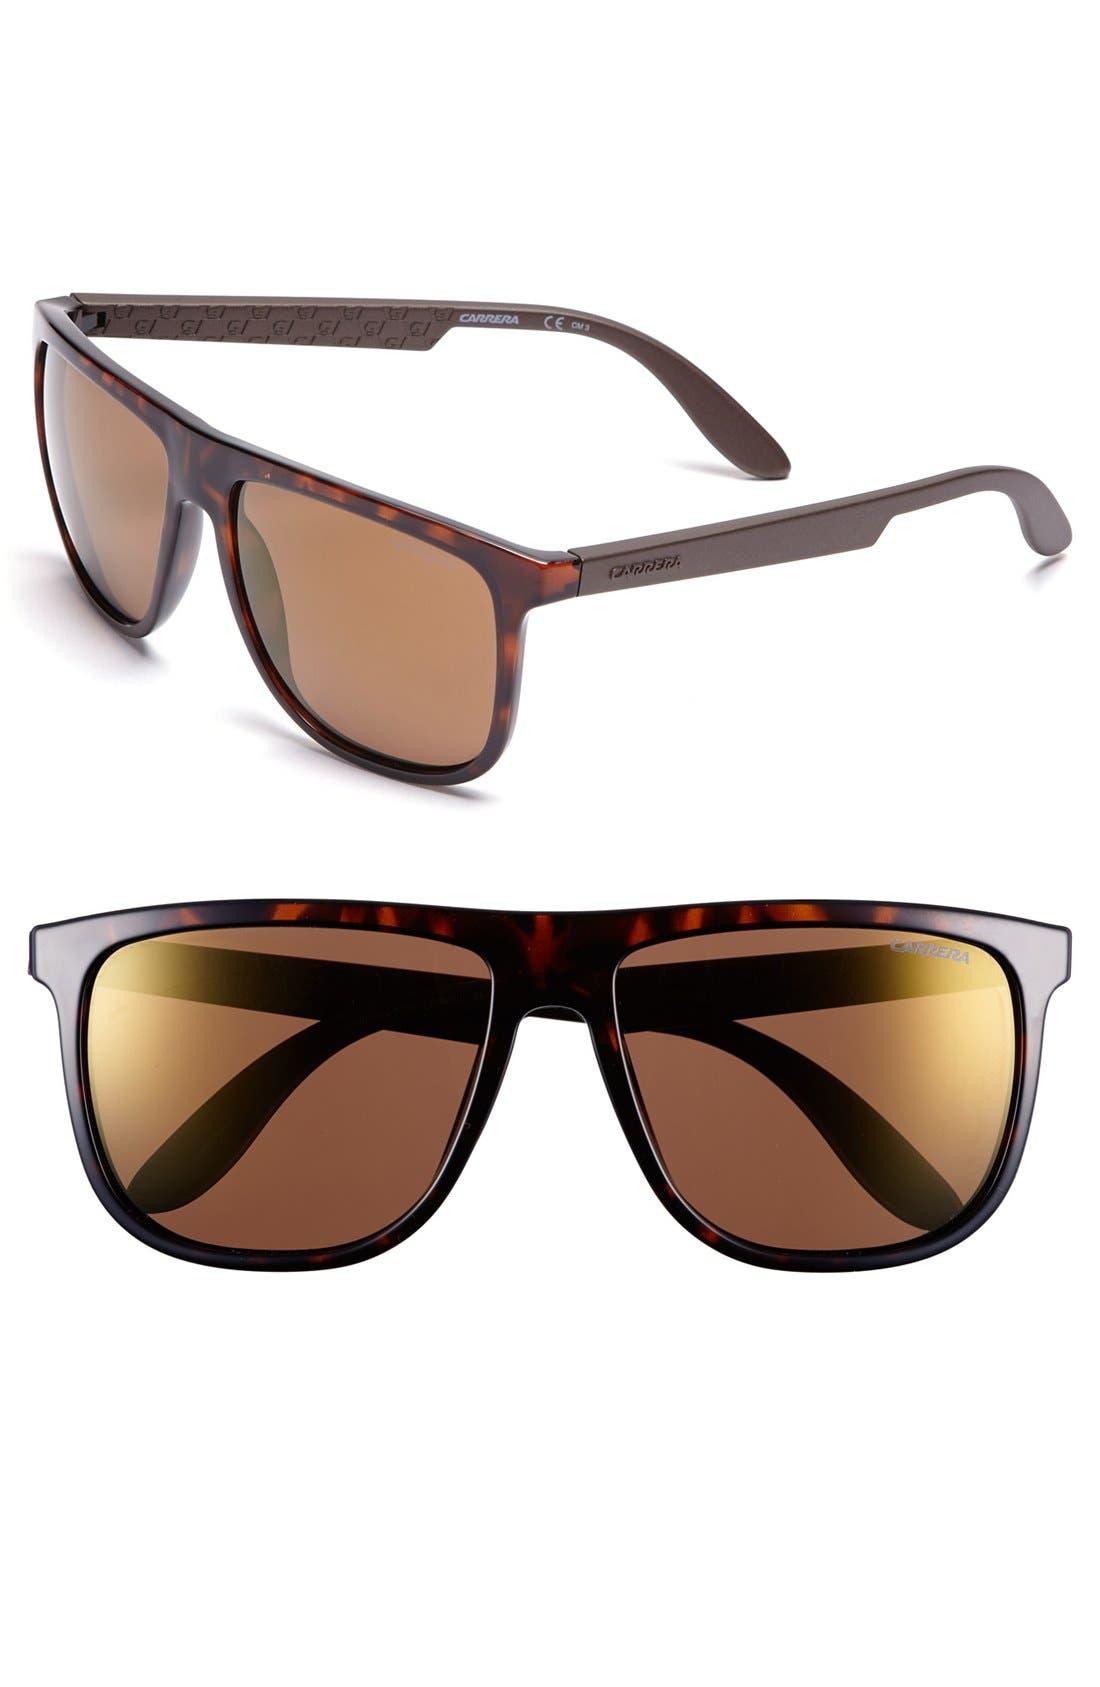 Carrera Eyewear 55mm Retro Sunglasses